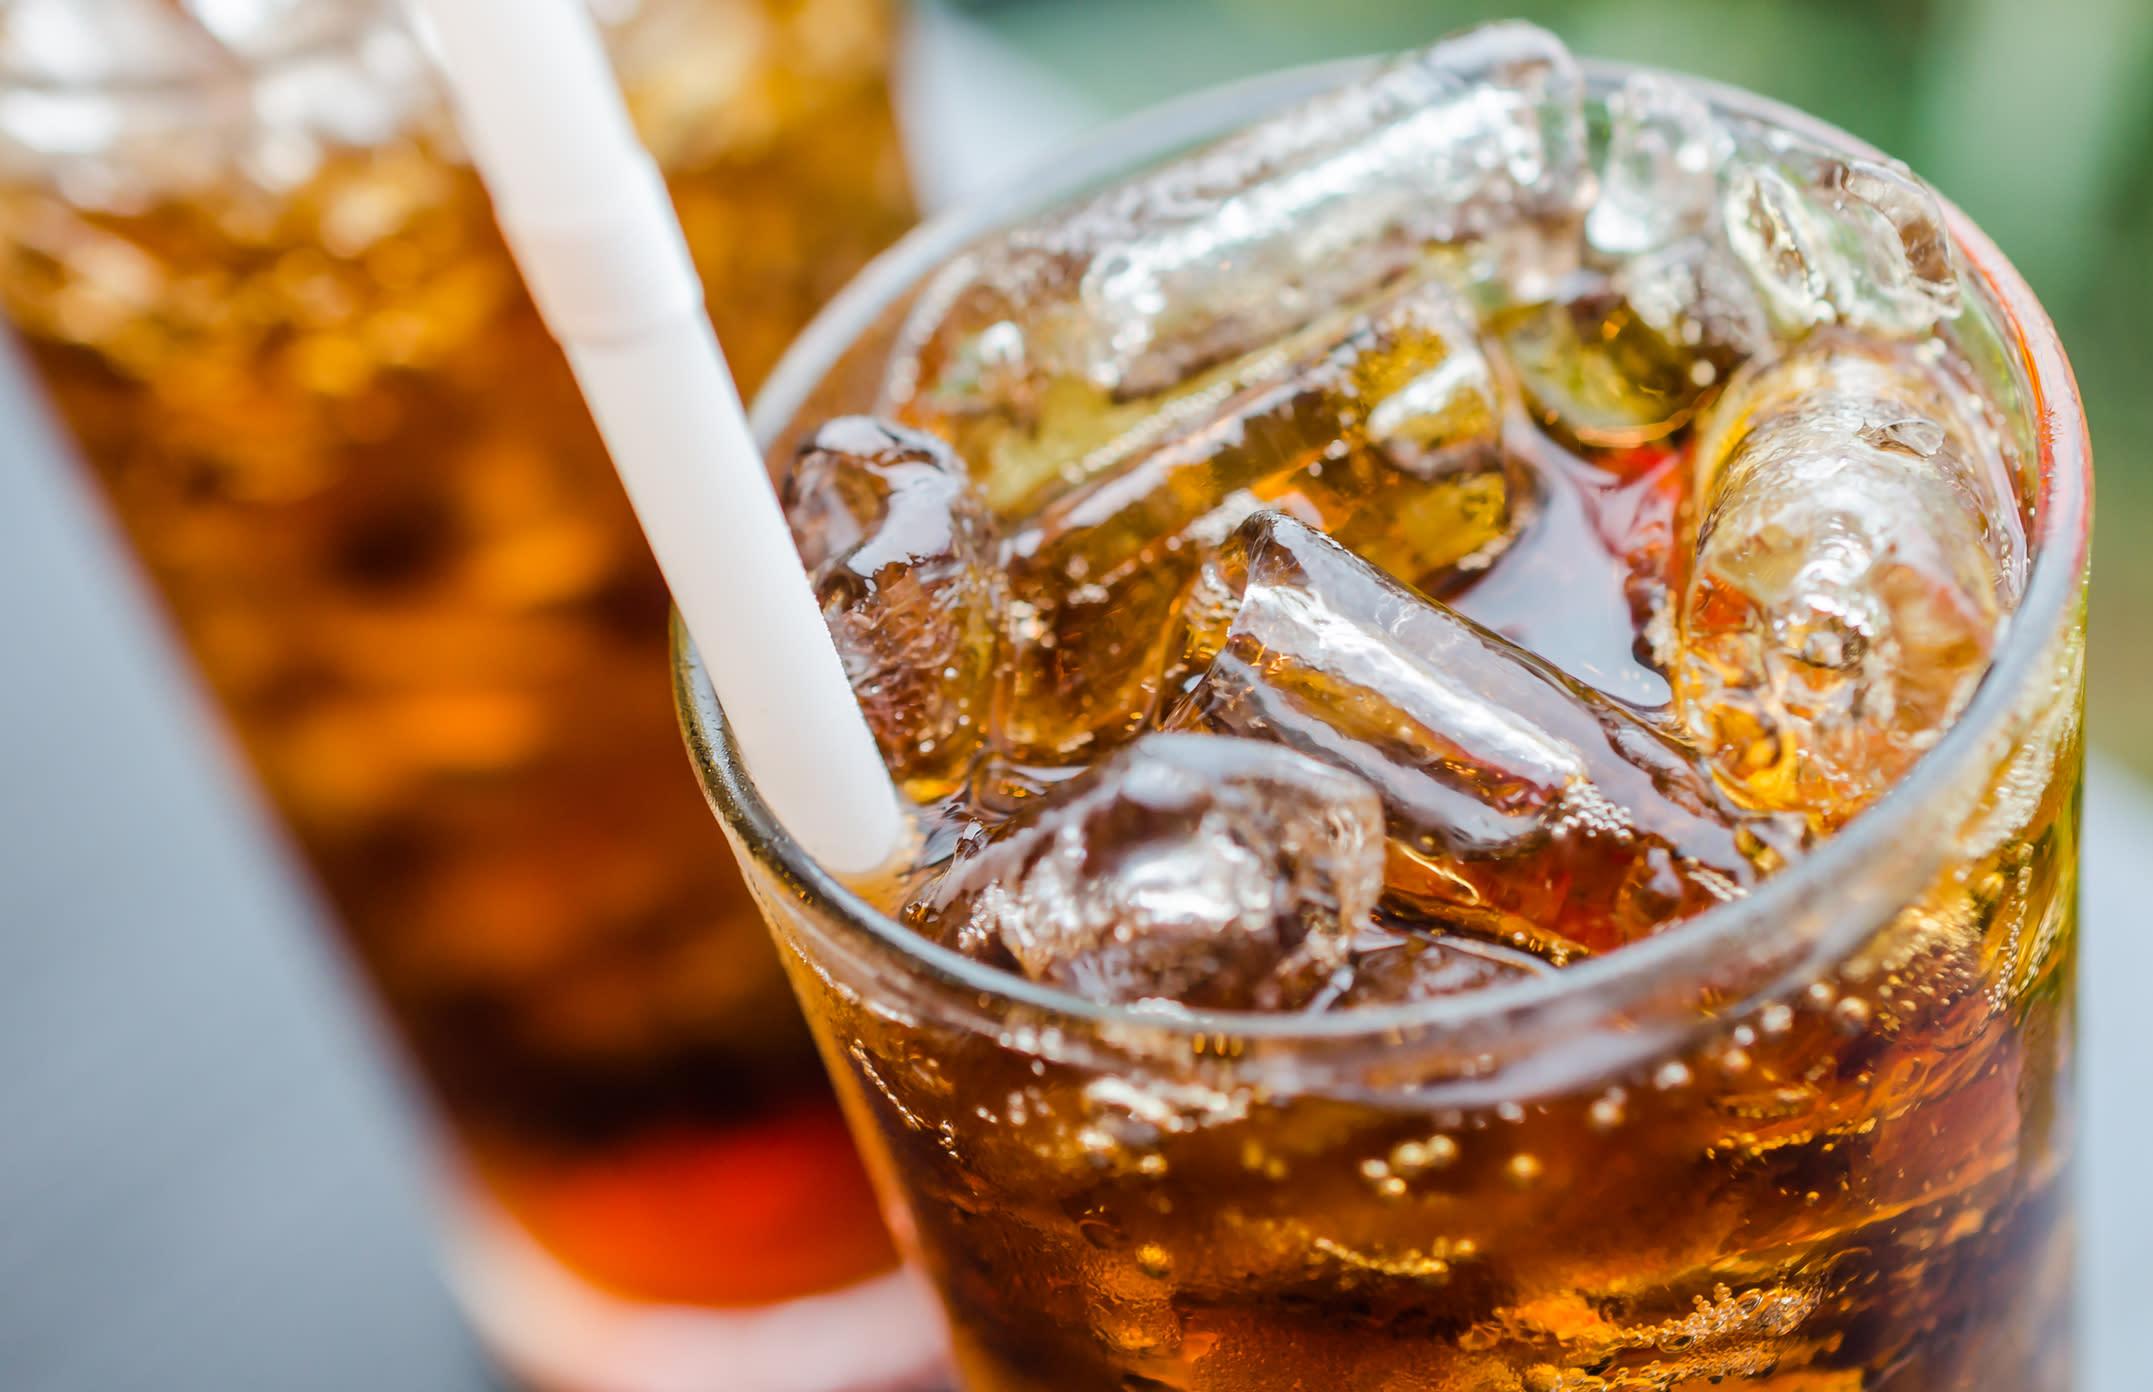 PepsiCo Talks Balancing Profitability and Growth